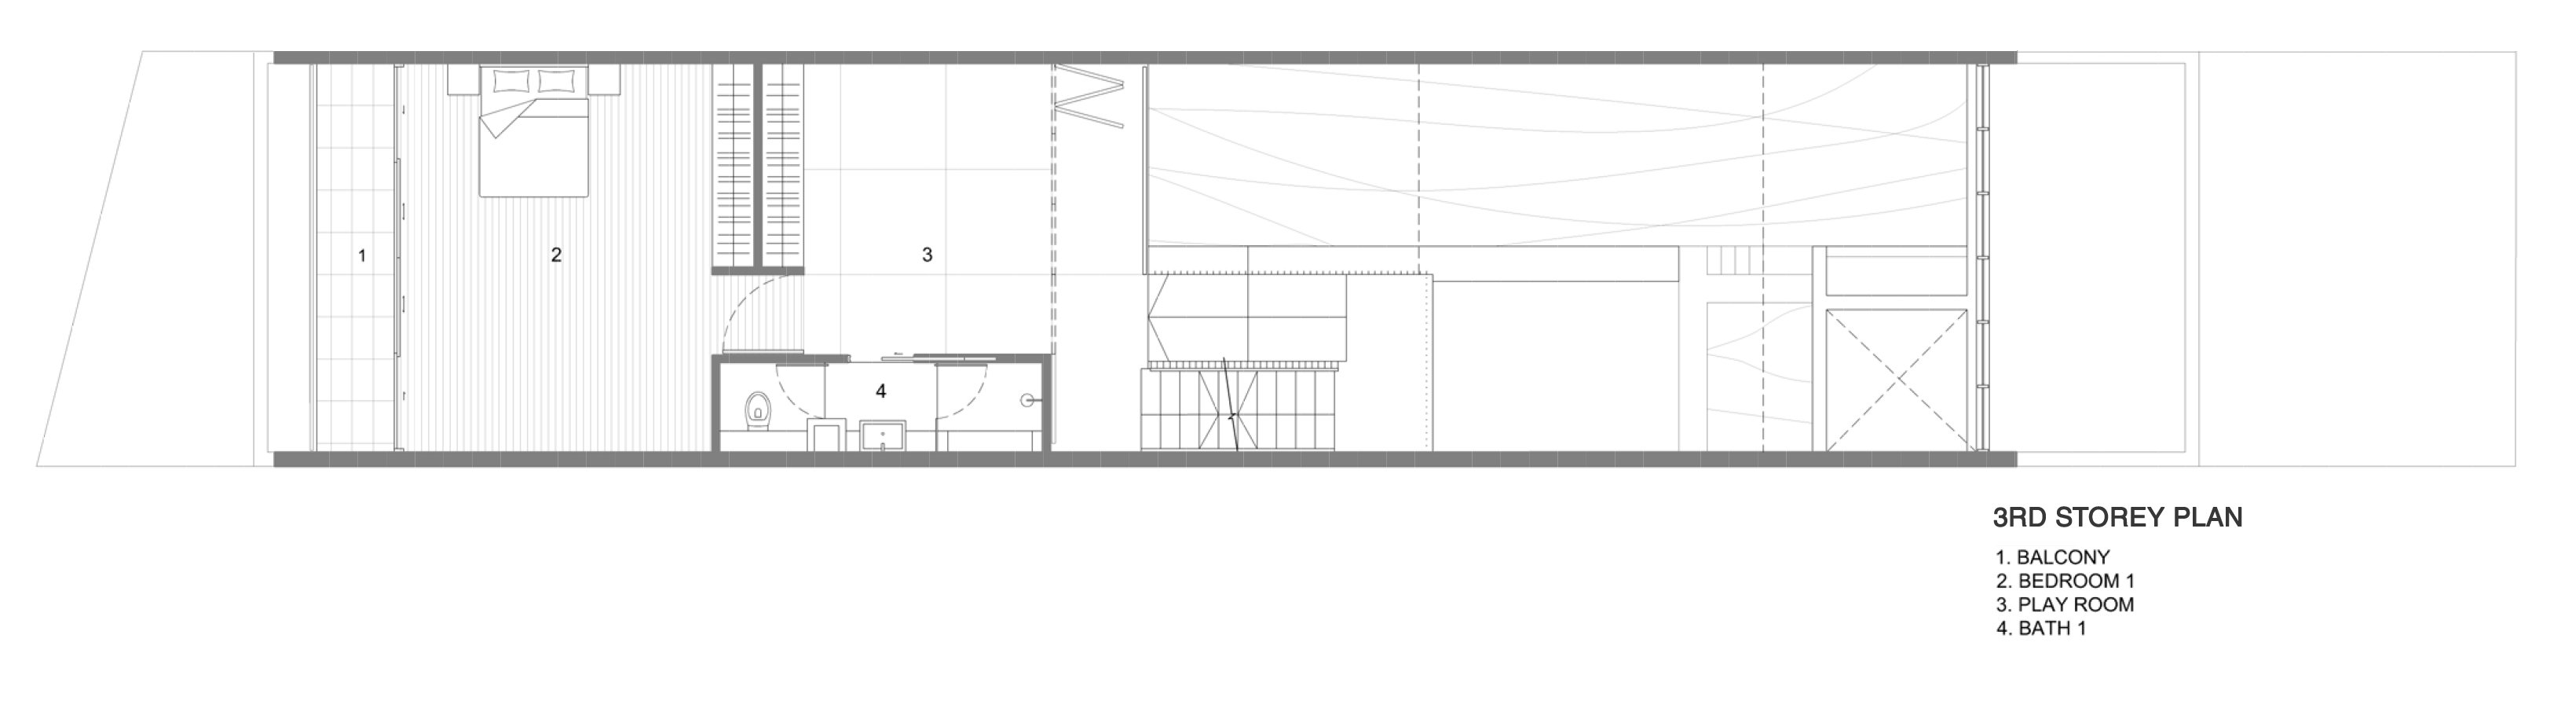 3rd Storey Plan Formwerkz Architects}